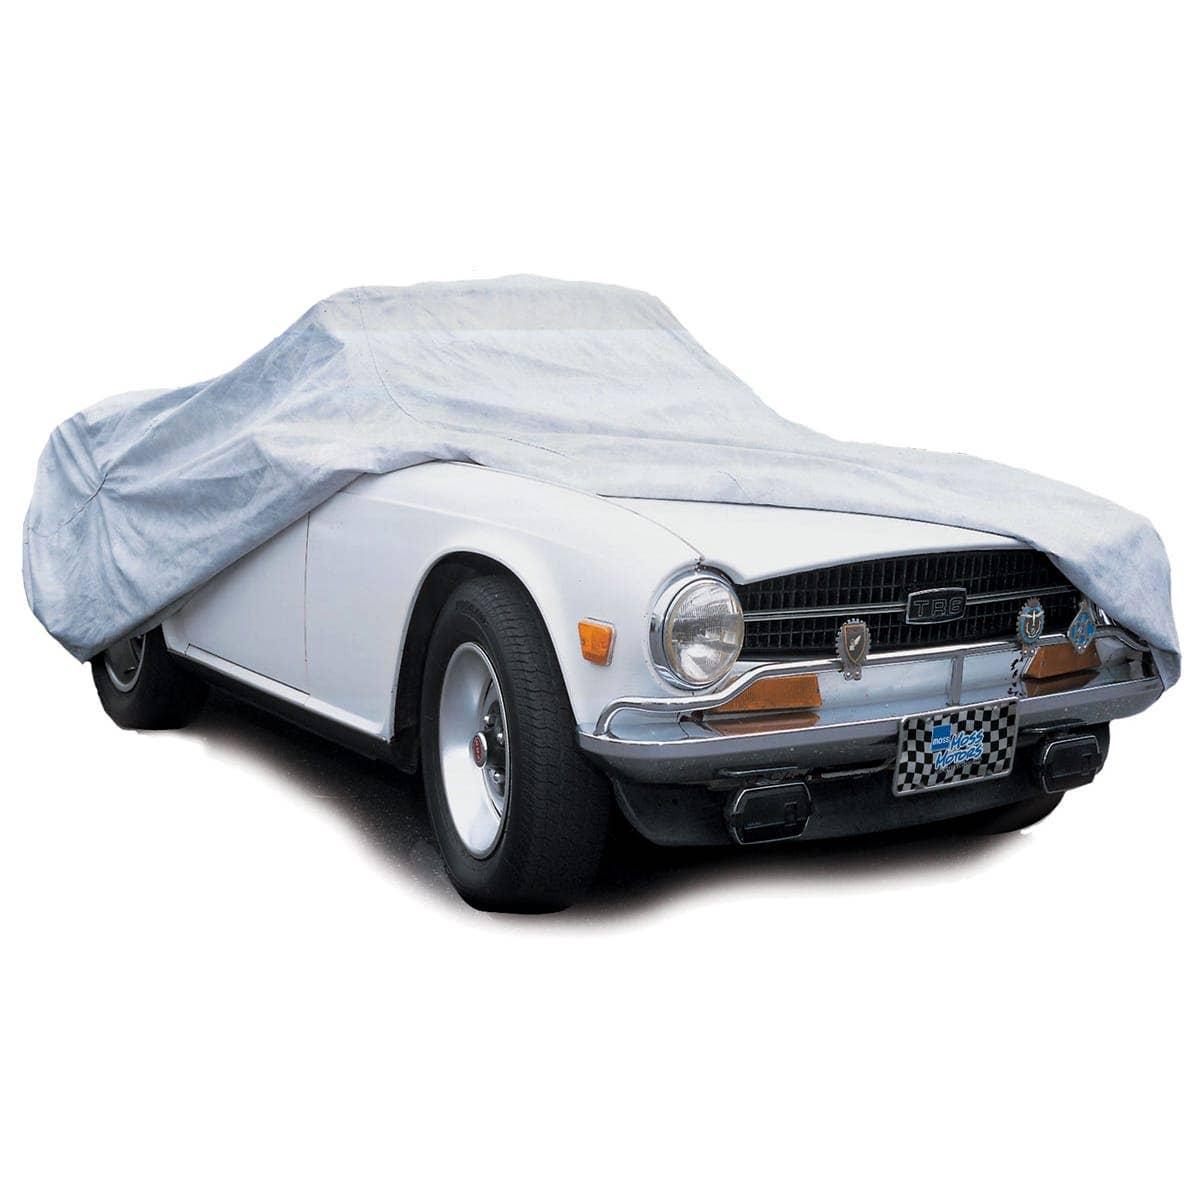 Mg Mgb 6 Layer Car Cover 1963 1964 1965 1966 1967 1968 1969 1970 1971 1972